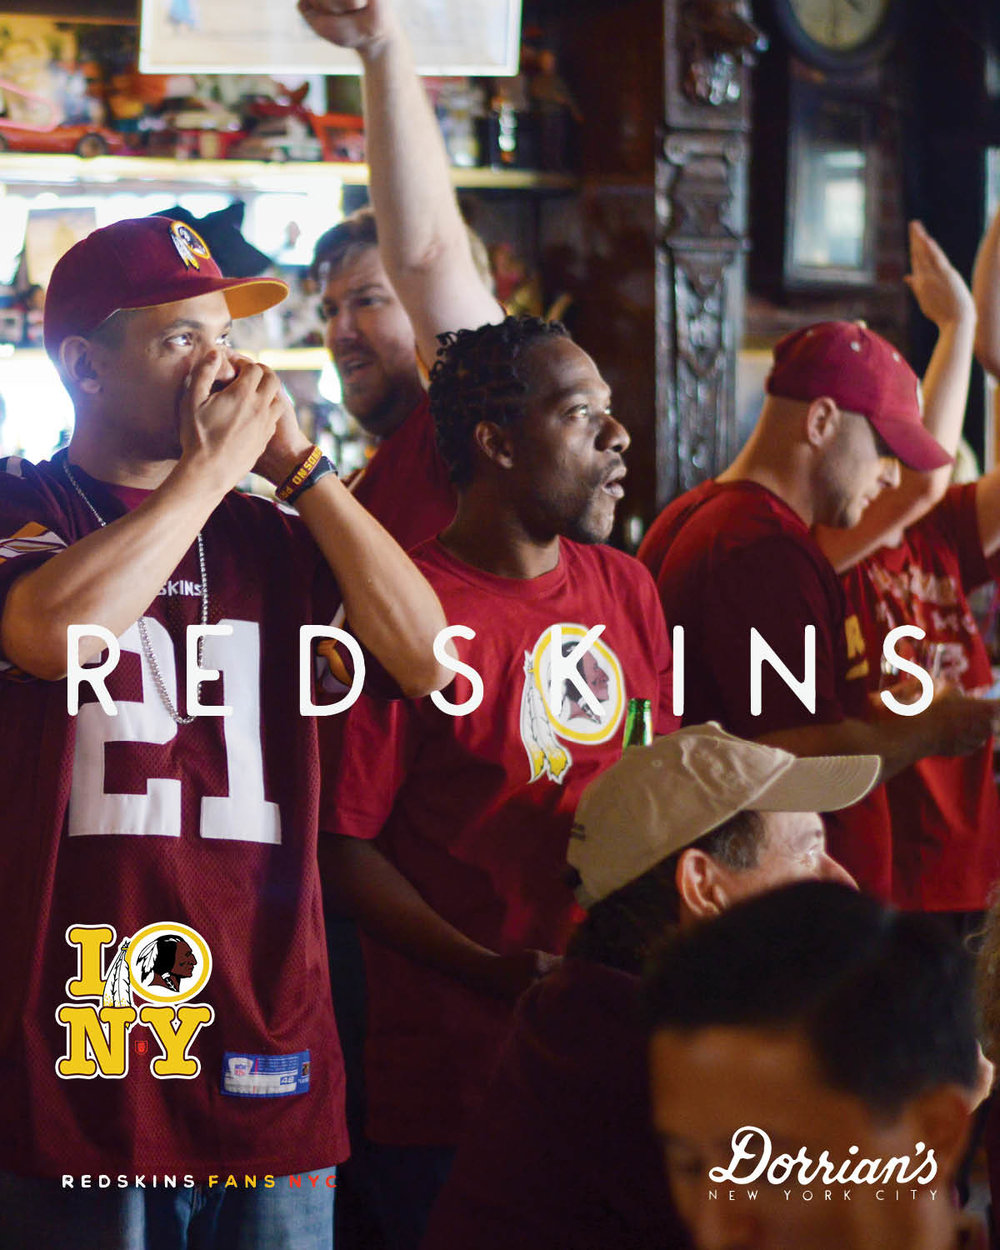 drh_nyc-2018-insta-redskins-bar-cheering-58.jpg